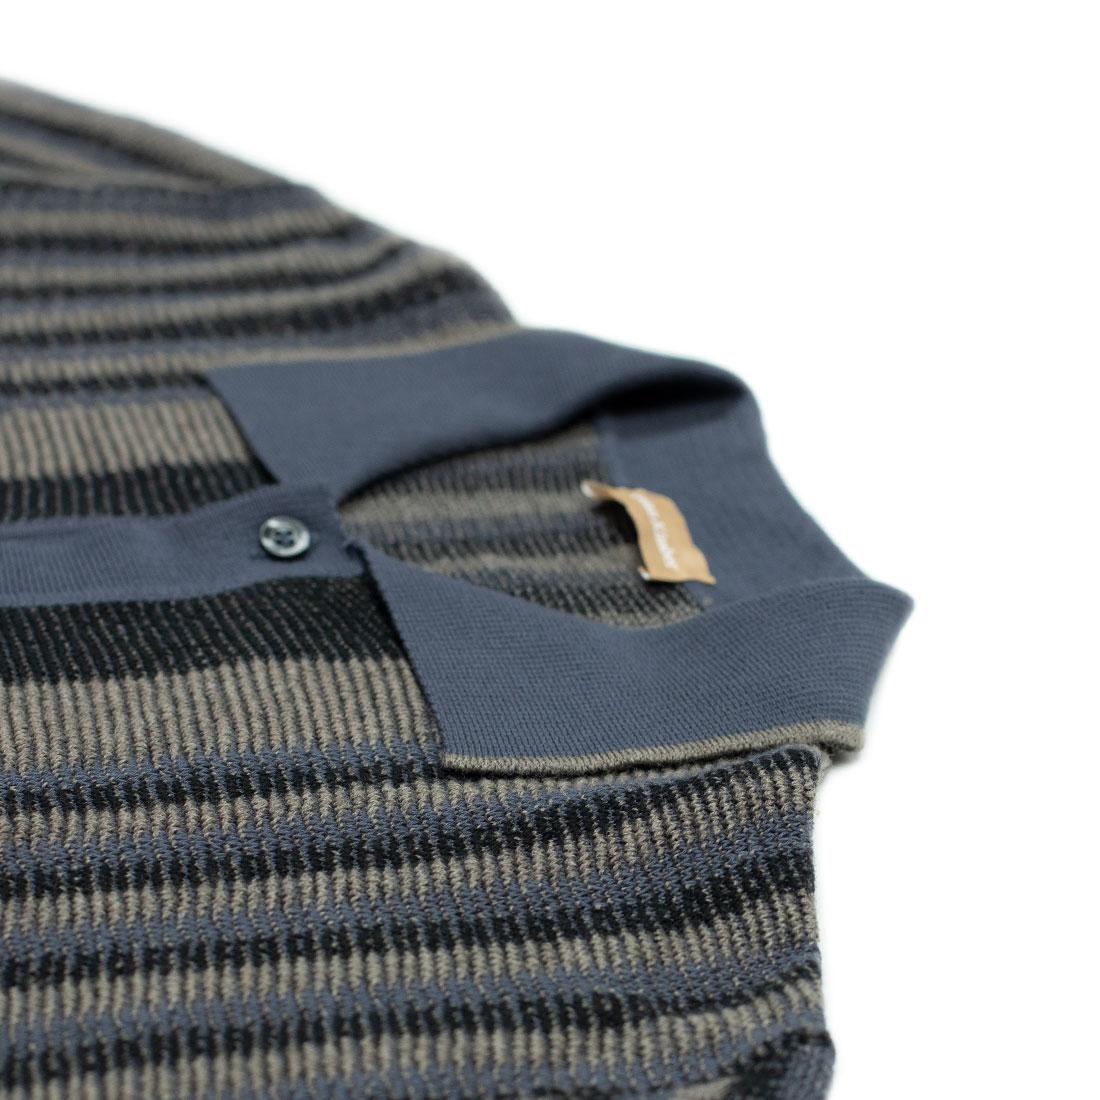 Kimber Ripley knit shirt (1).jpg